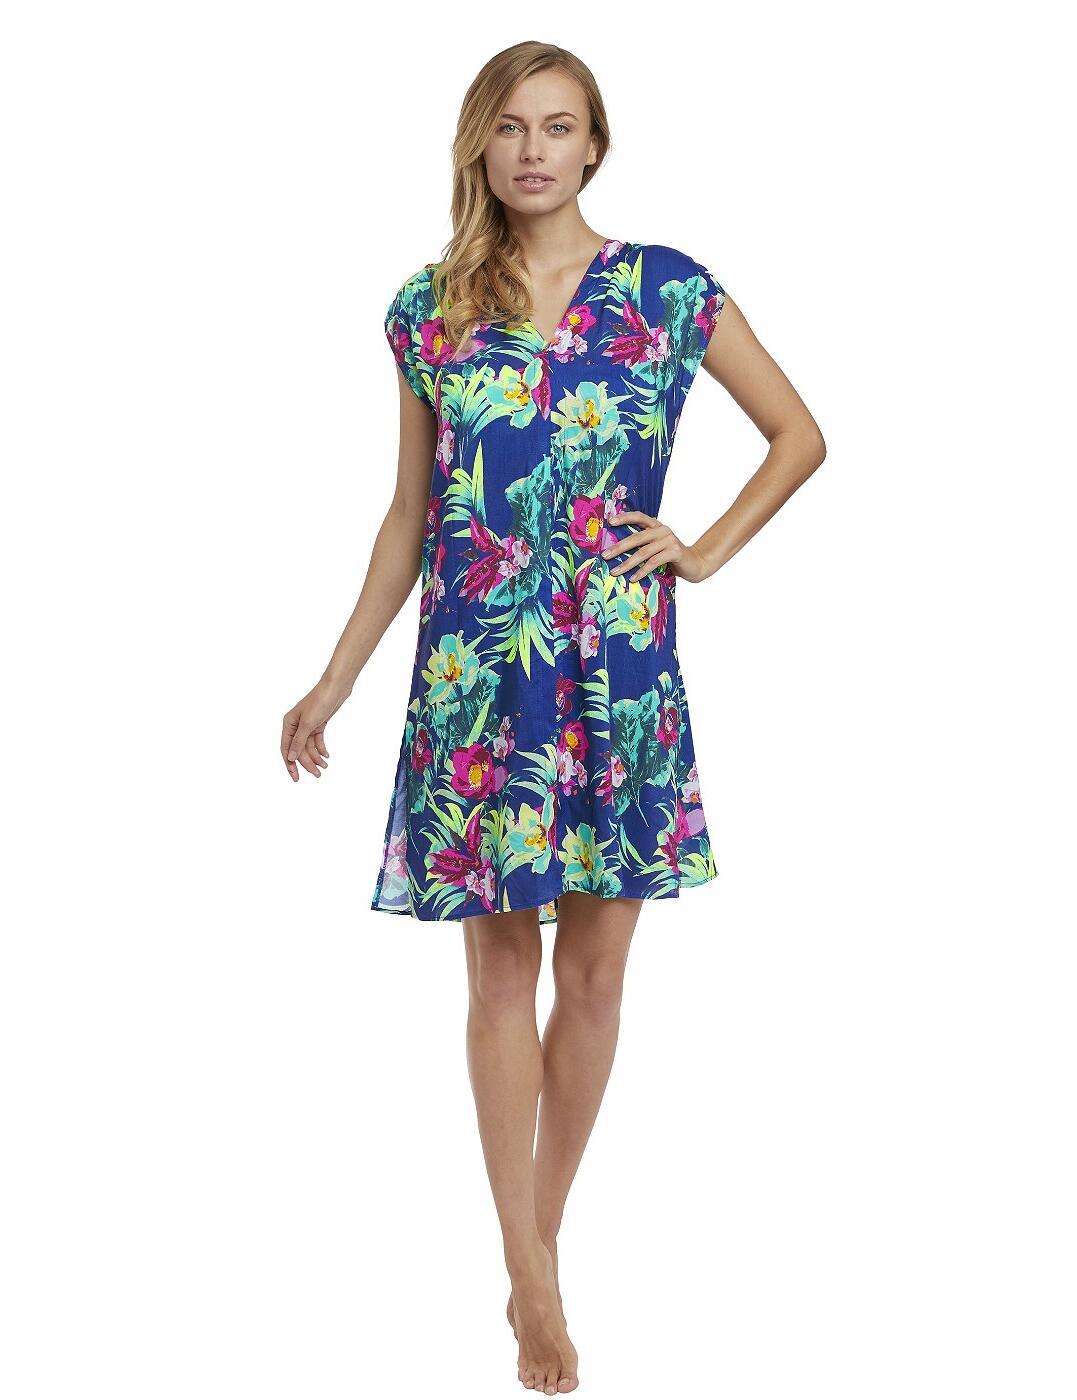 6537 Fantasie Amalfi Tunic Dress - 6537 Multi